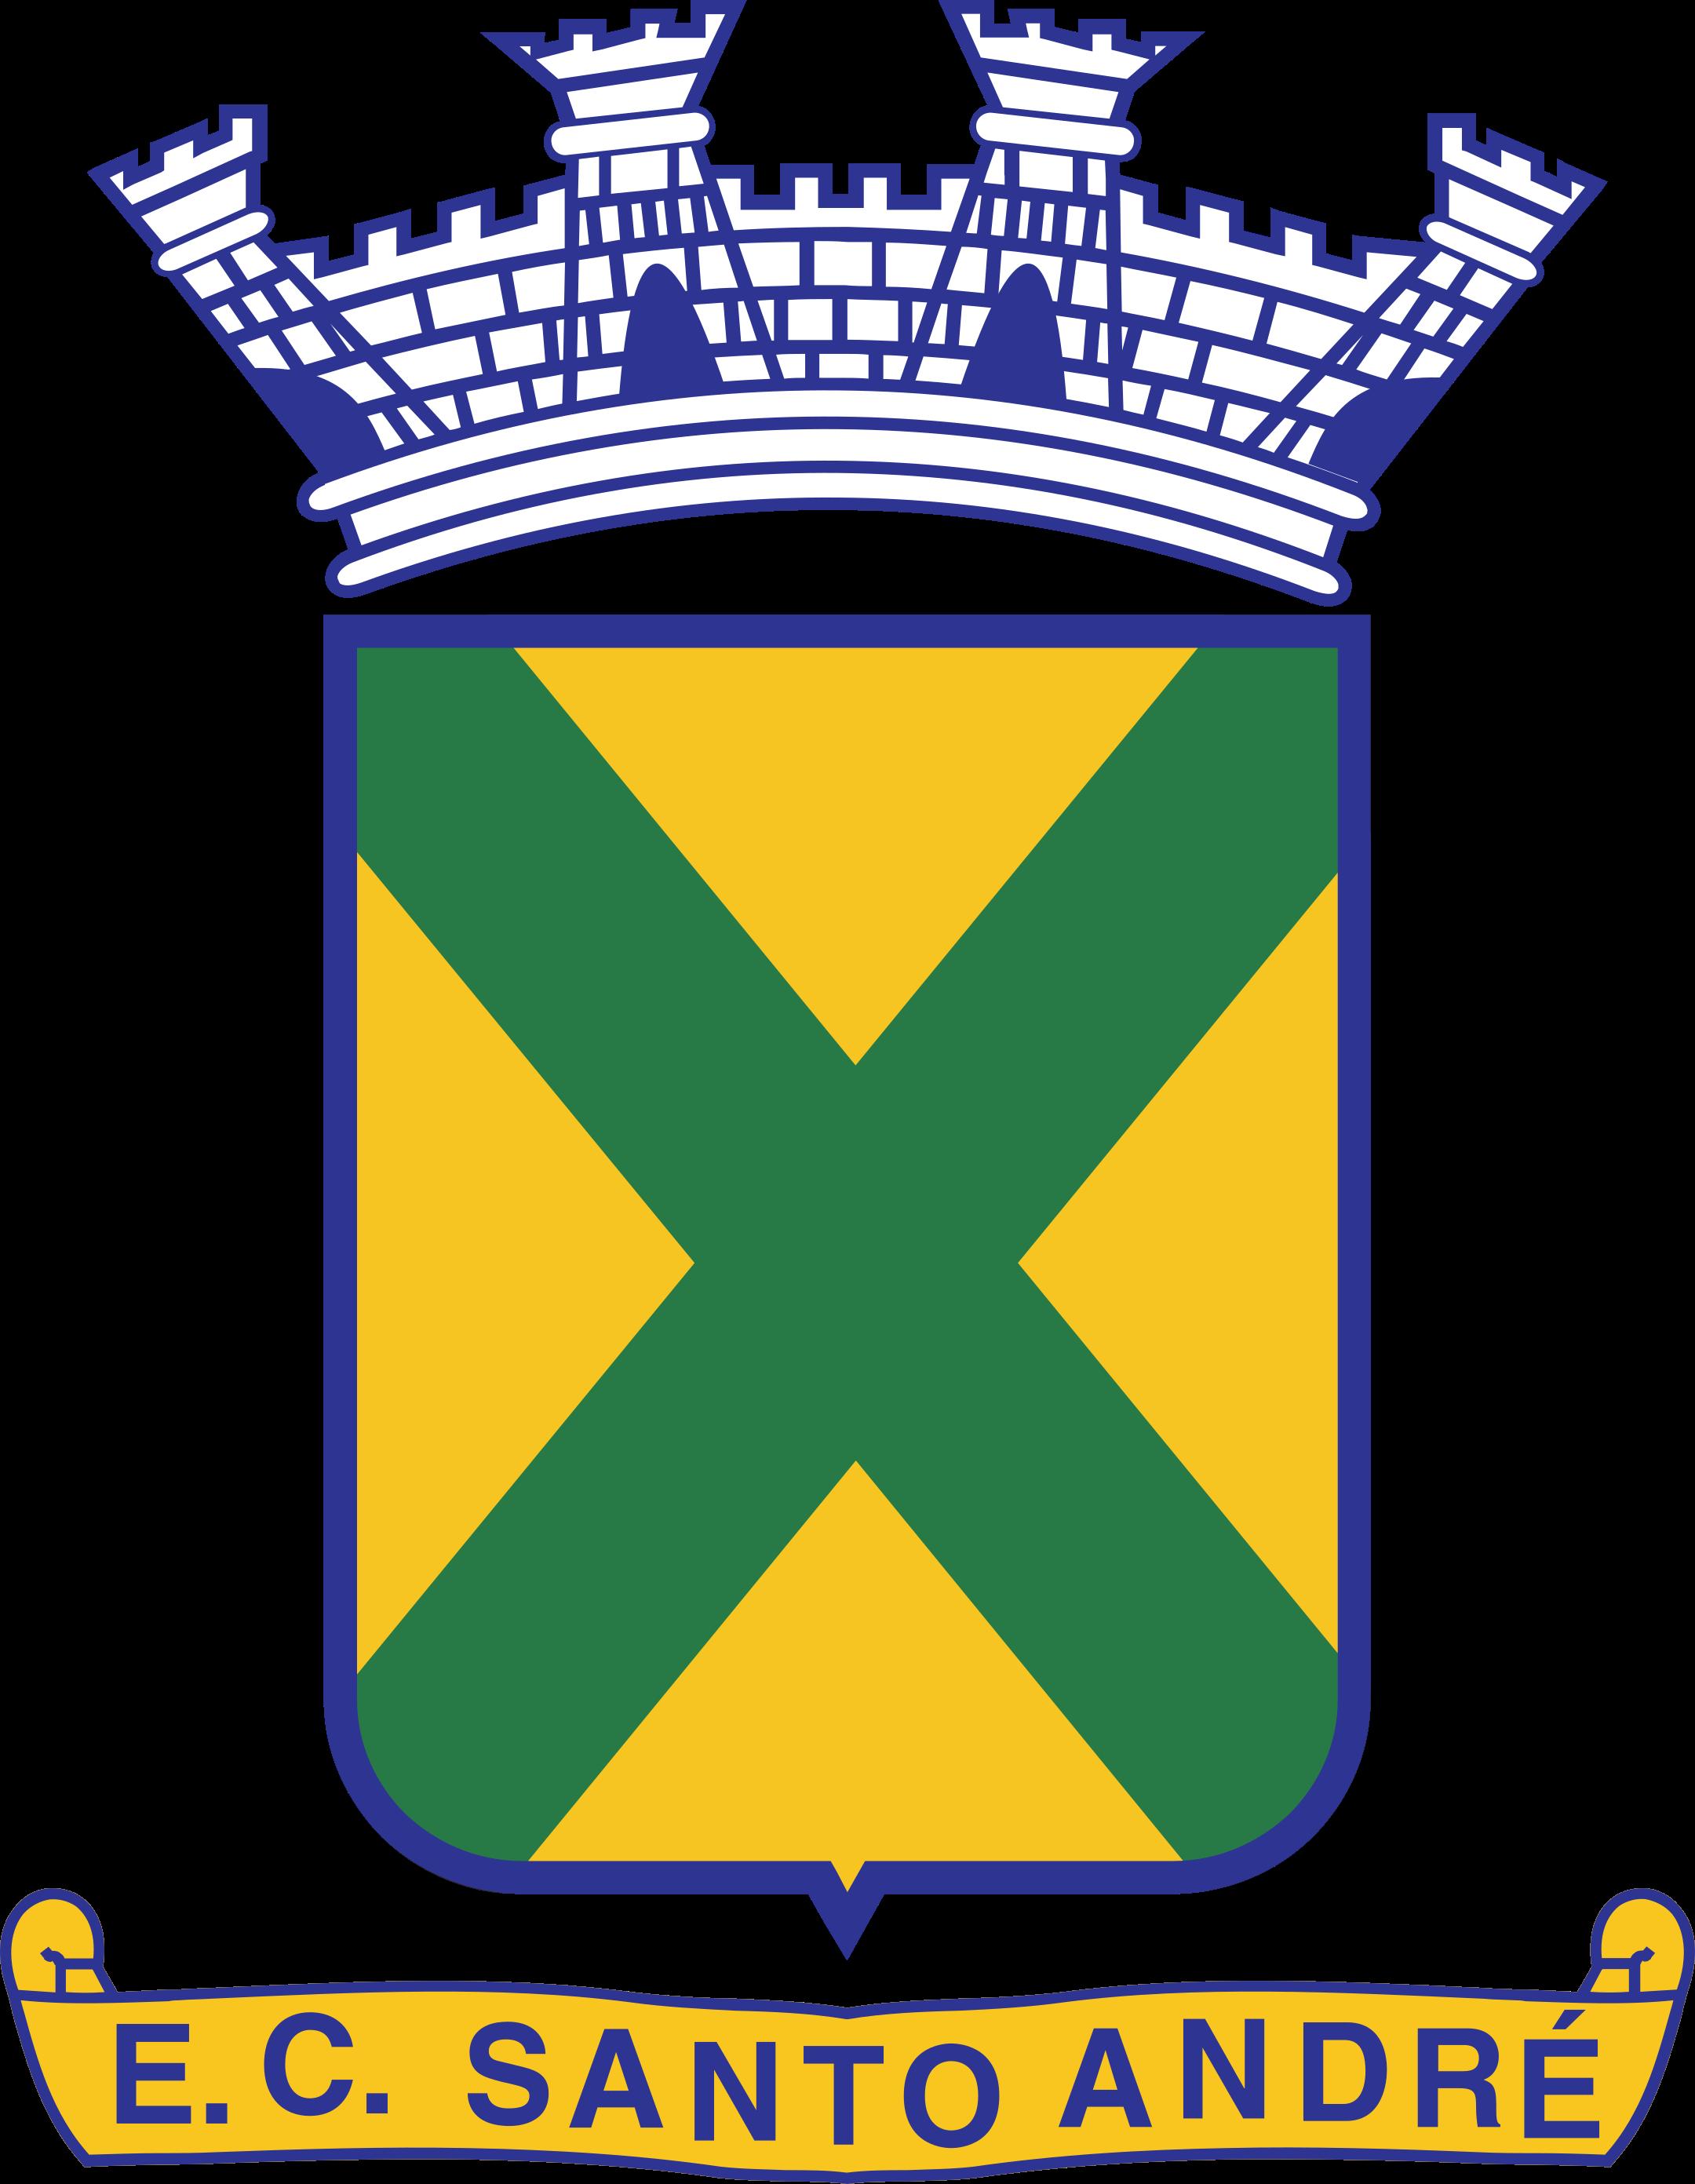 ec santo andre logo 1 - EC Santo André Logo